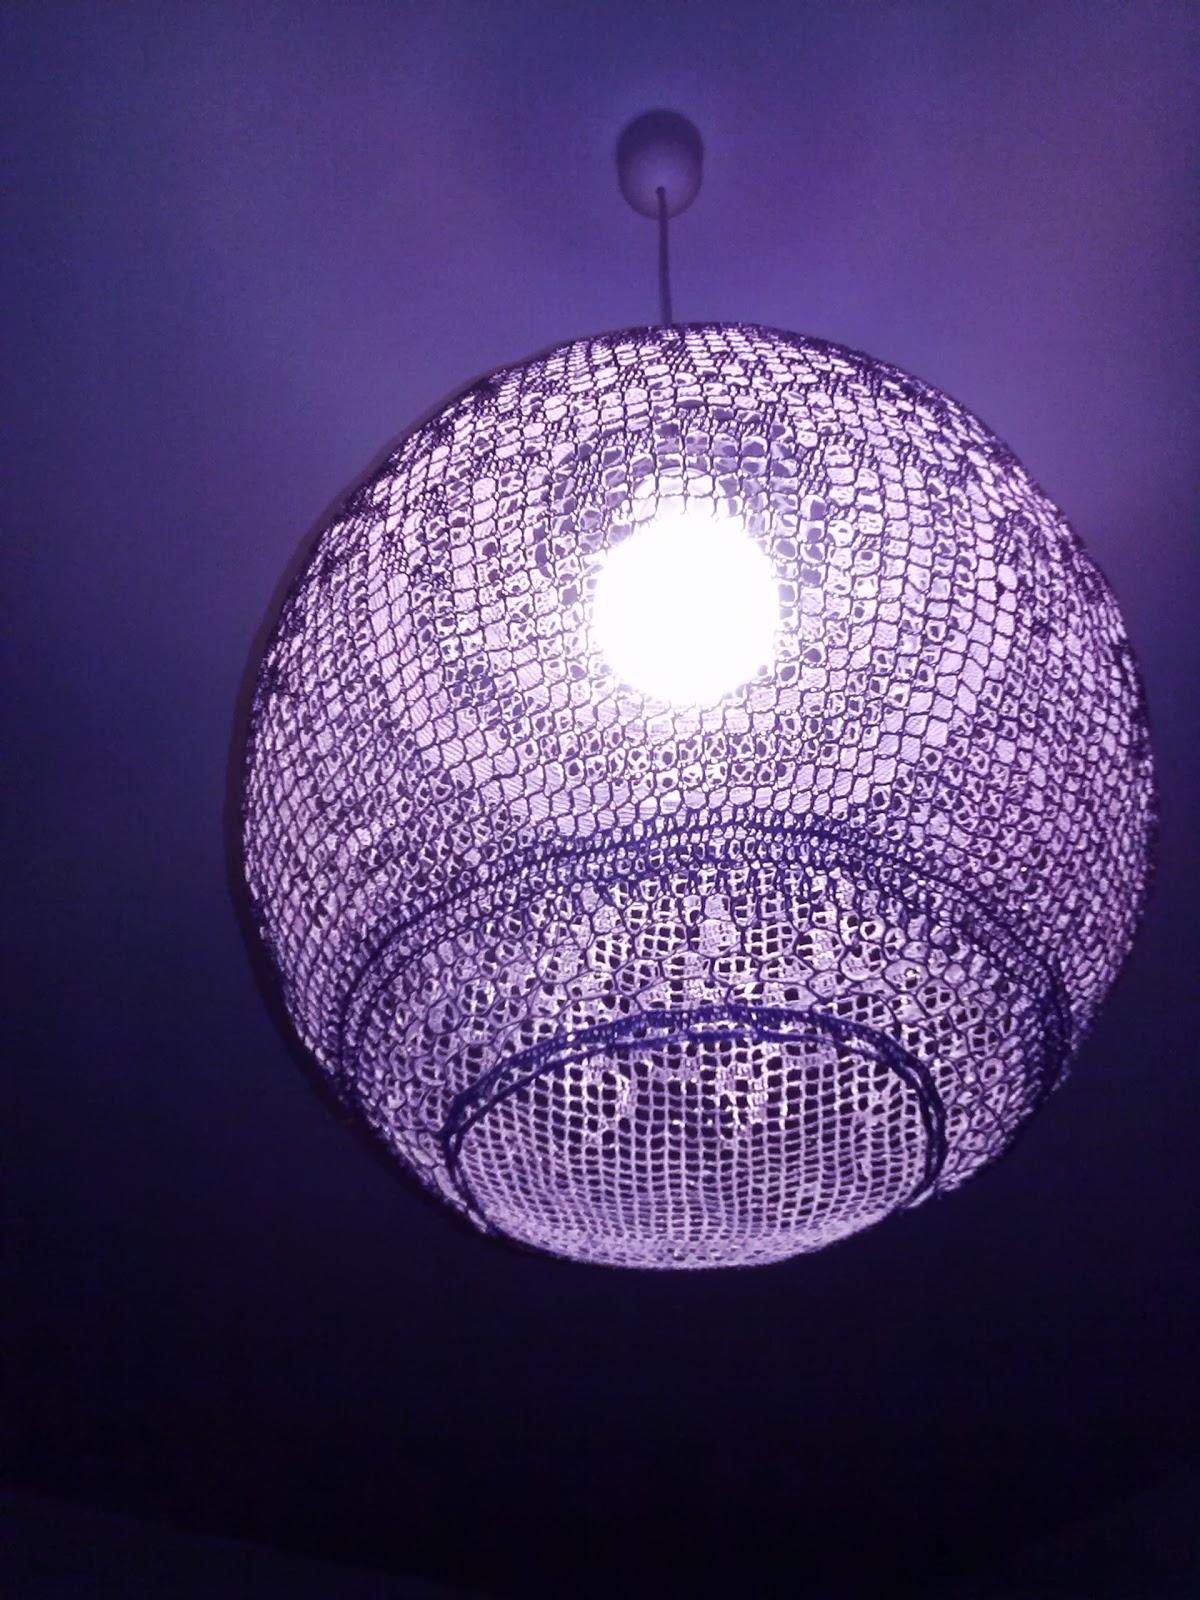 Creare Un Lampadario Di Stoffa barabao: lampadario all'uncinetto